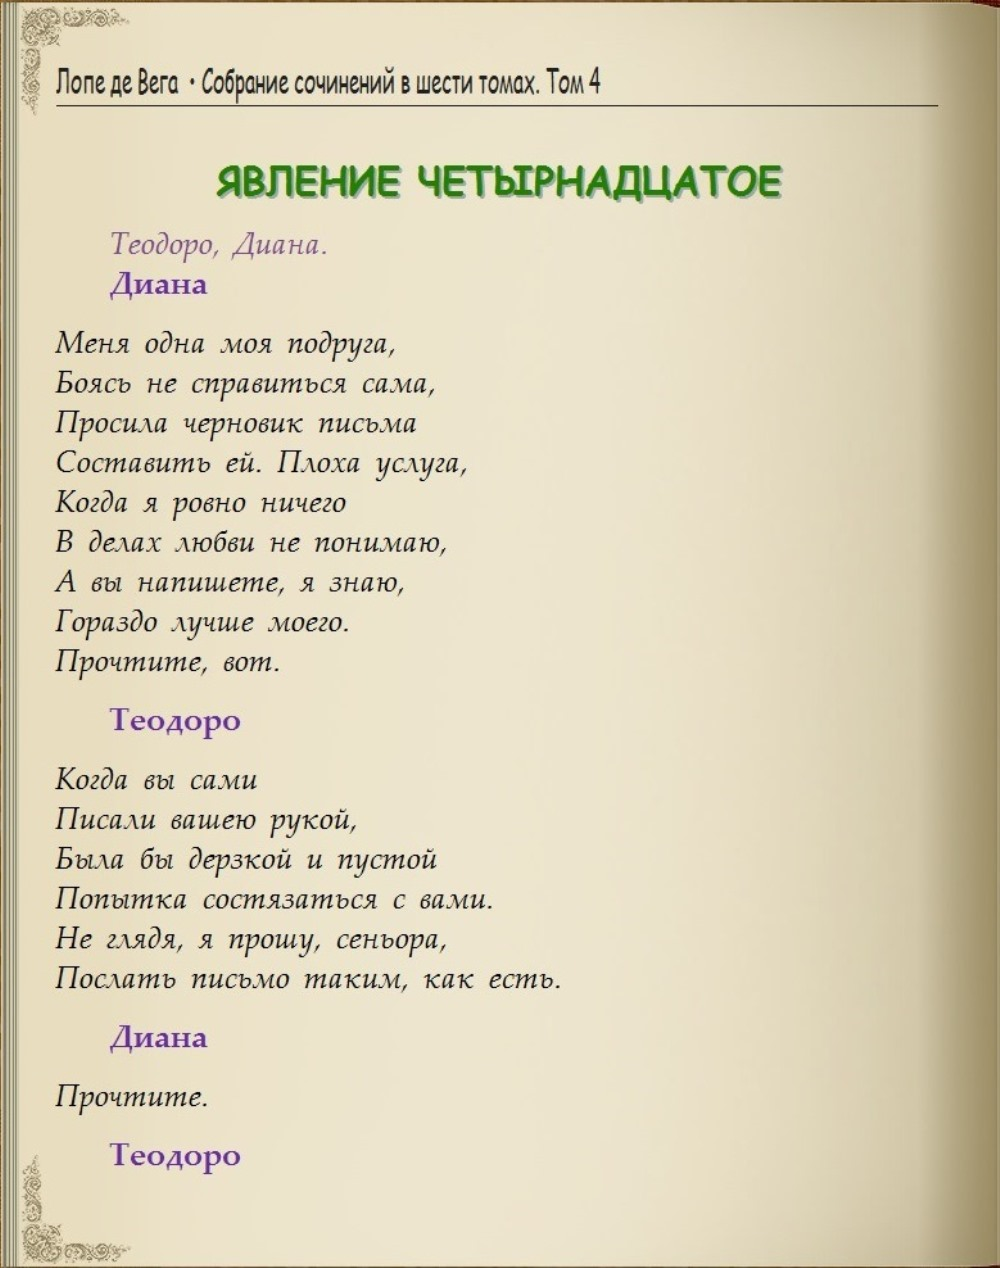 http://i1.imageban.ru/out/2013/11/07/2ec4a7711e9665f9ef643d68c00f59bb.jpg